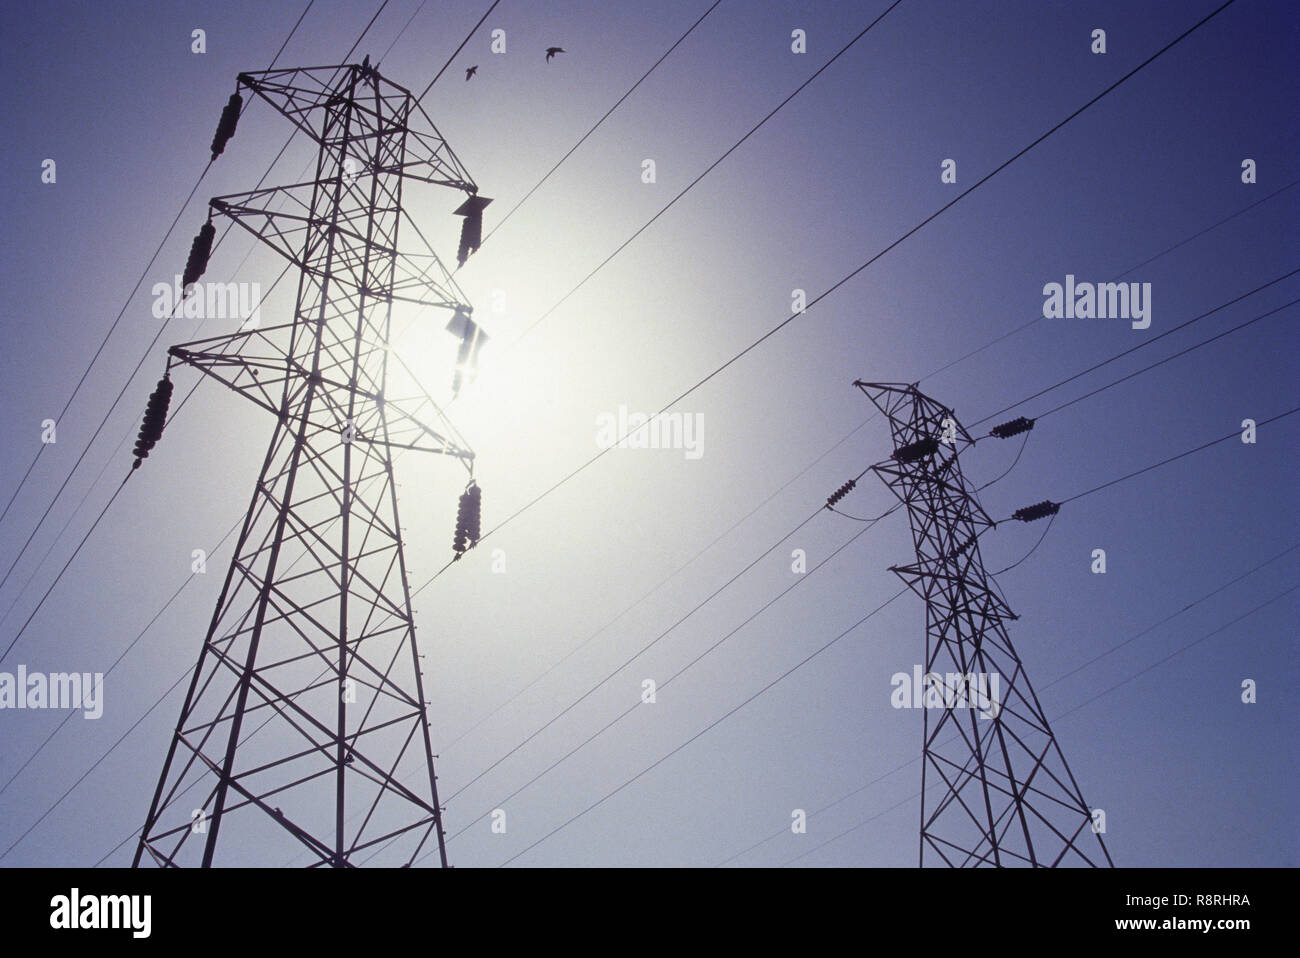 Elektrische Stromleitungen, Bombay, Mumbai, Maharashtra, Indien Stockbild